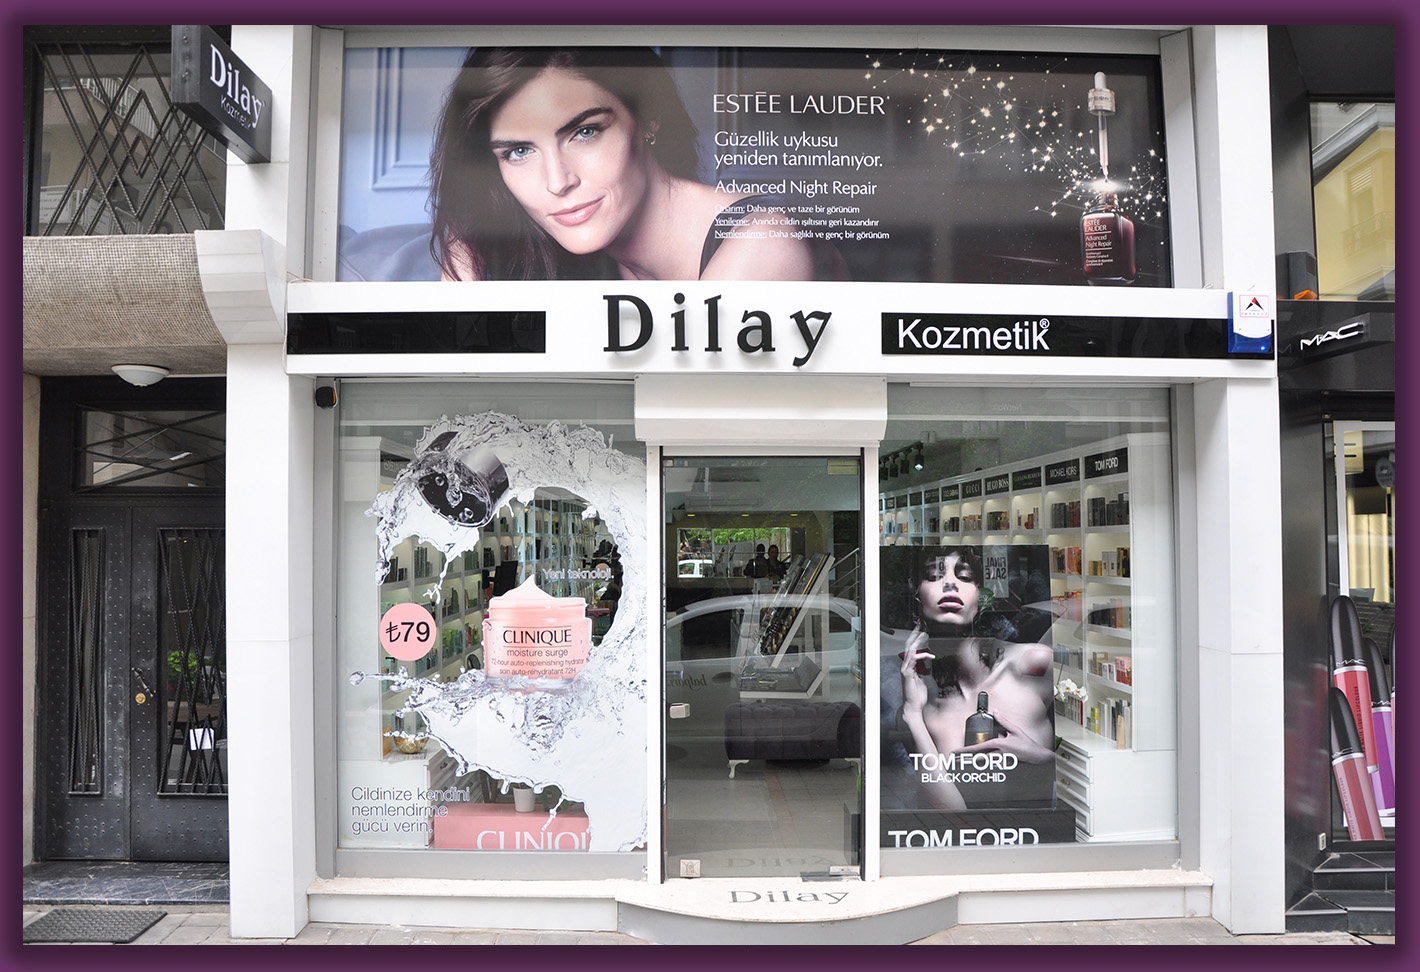 Dilay Kozmetik Antalya